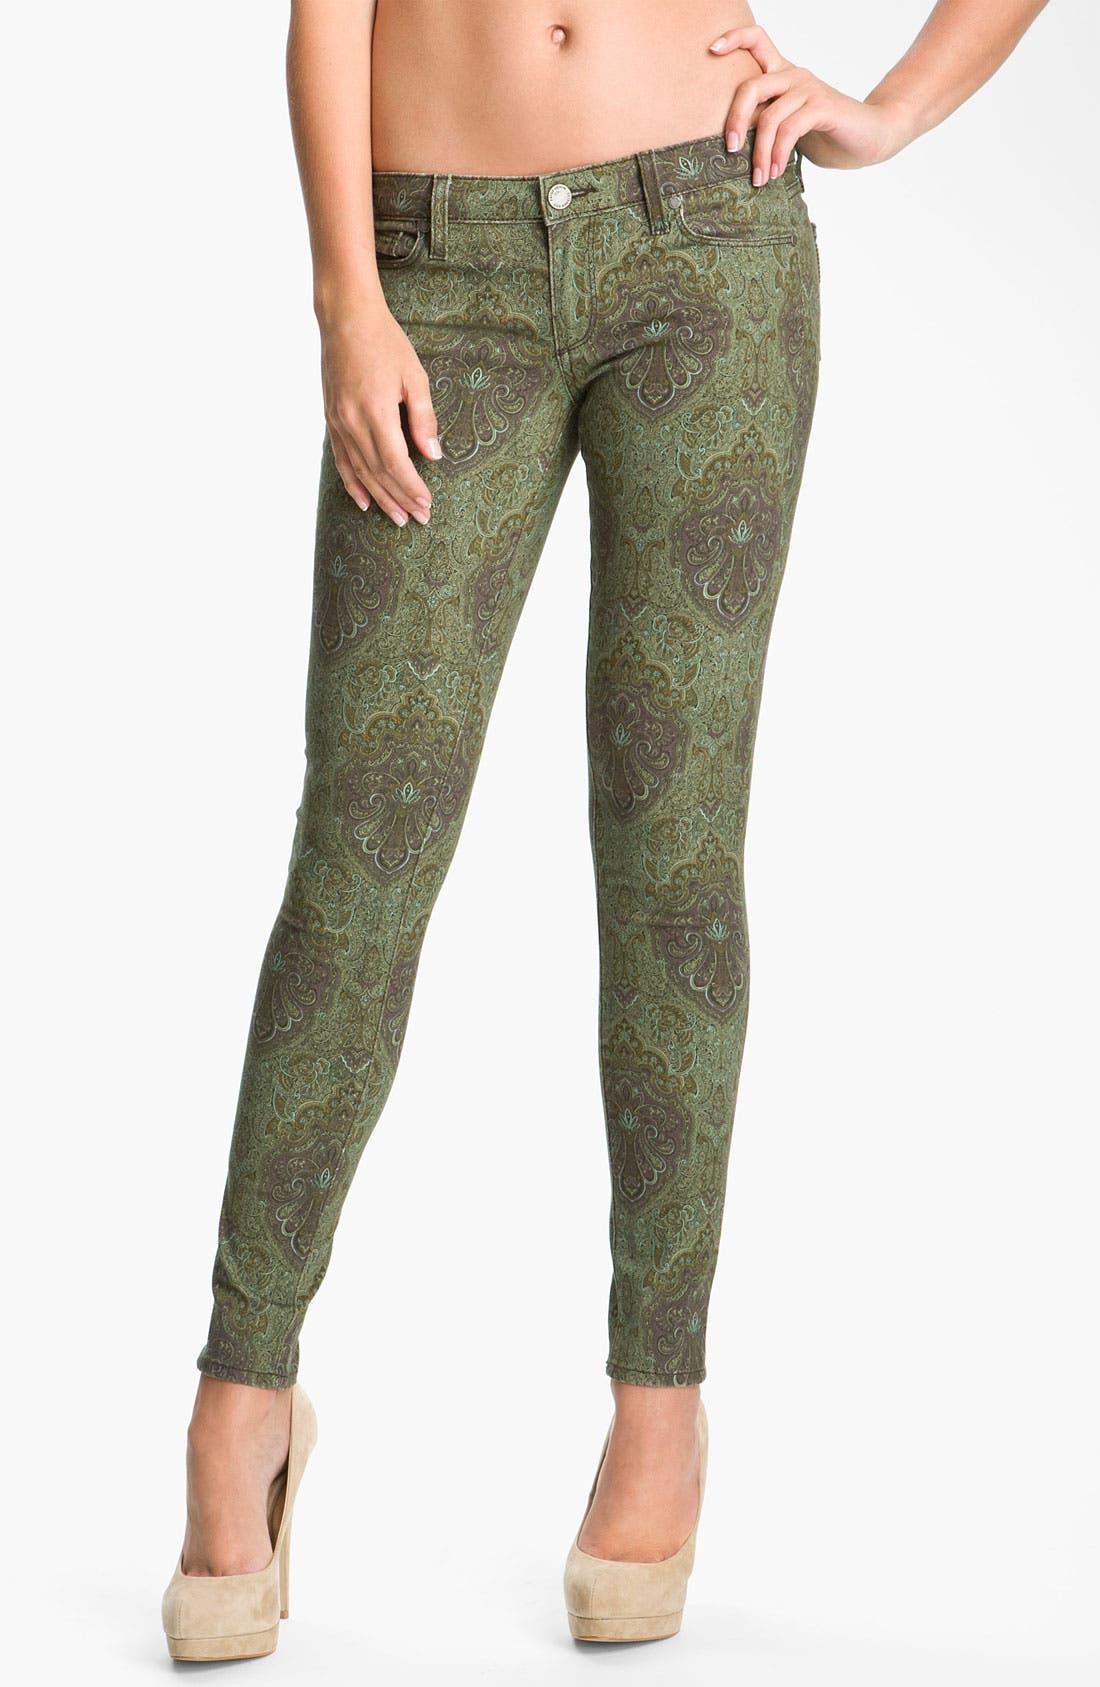 Alternate Image 1 Selected - Paige Denim 'Verdugo' Print Skinny Jeans (Estate Green Paisley)